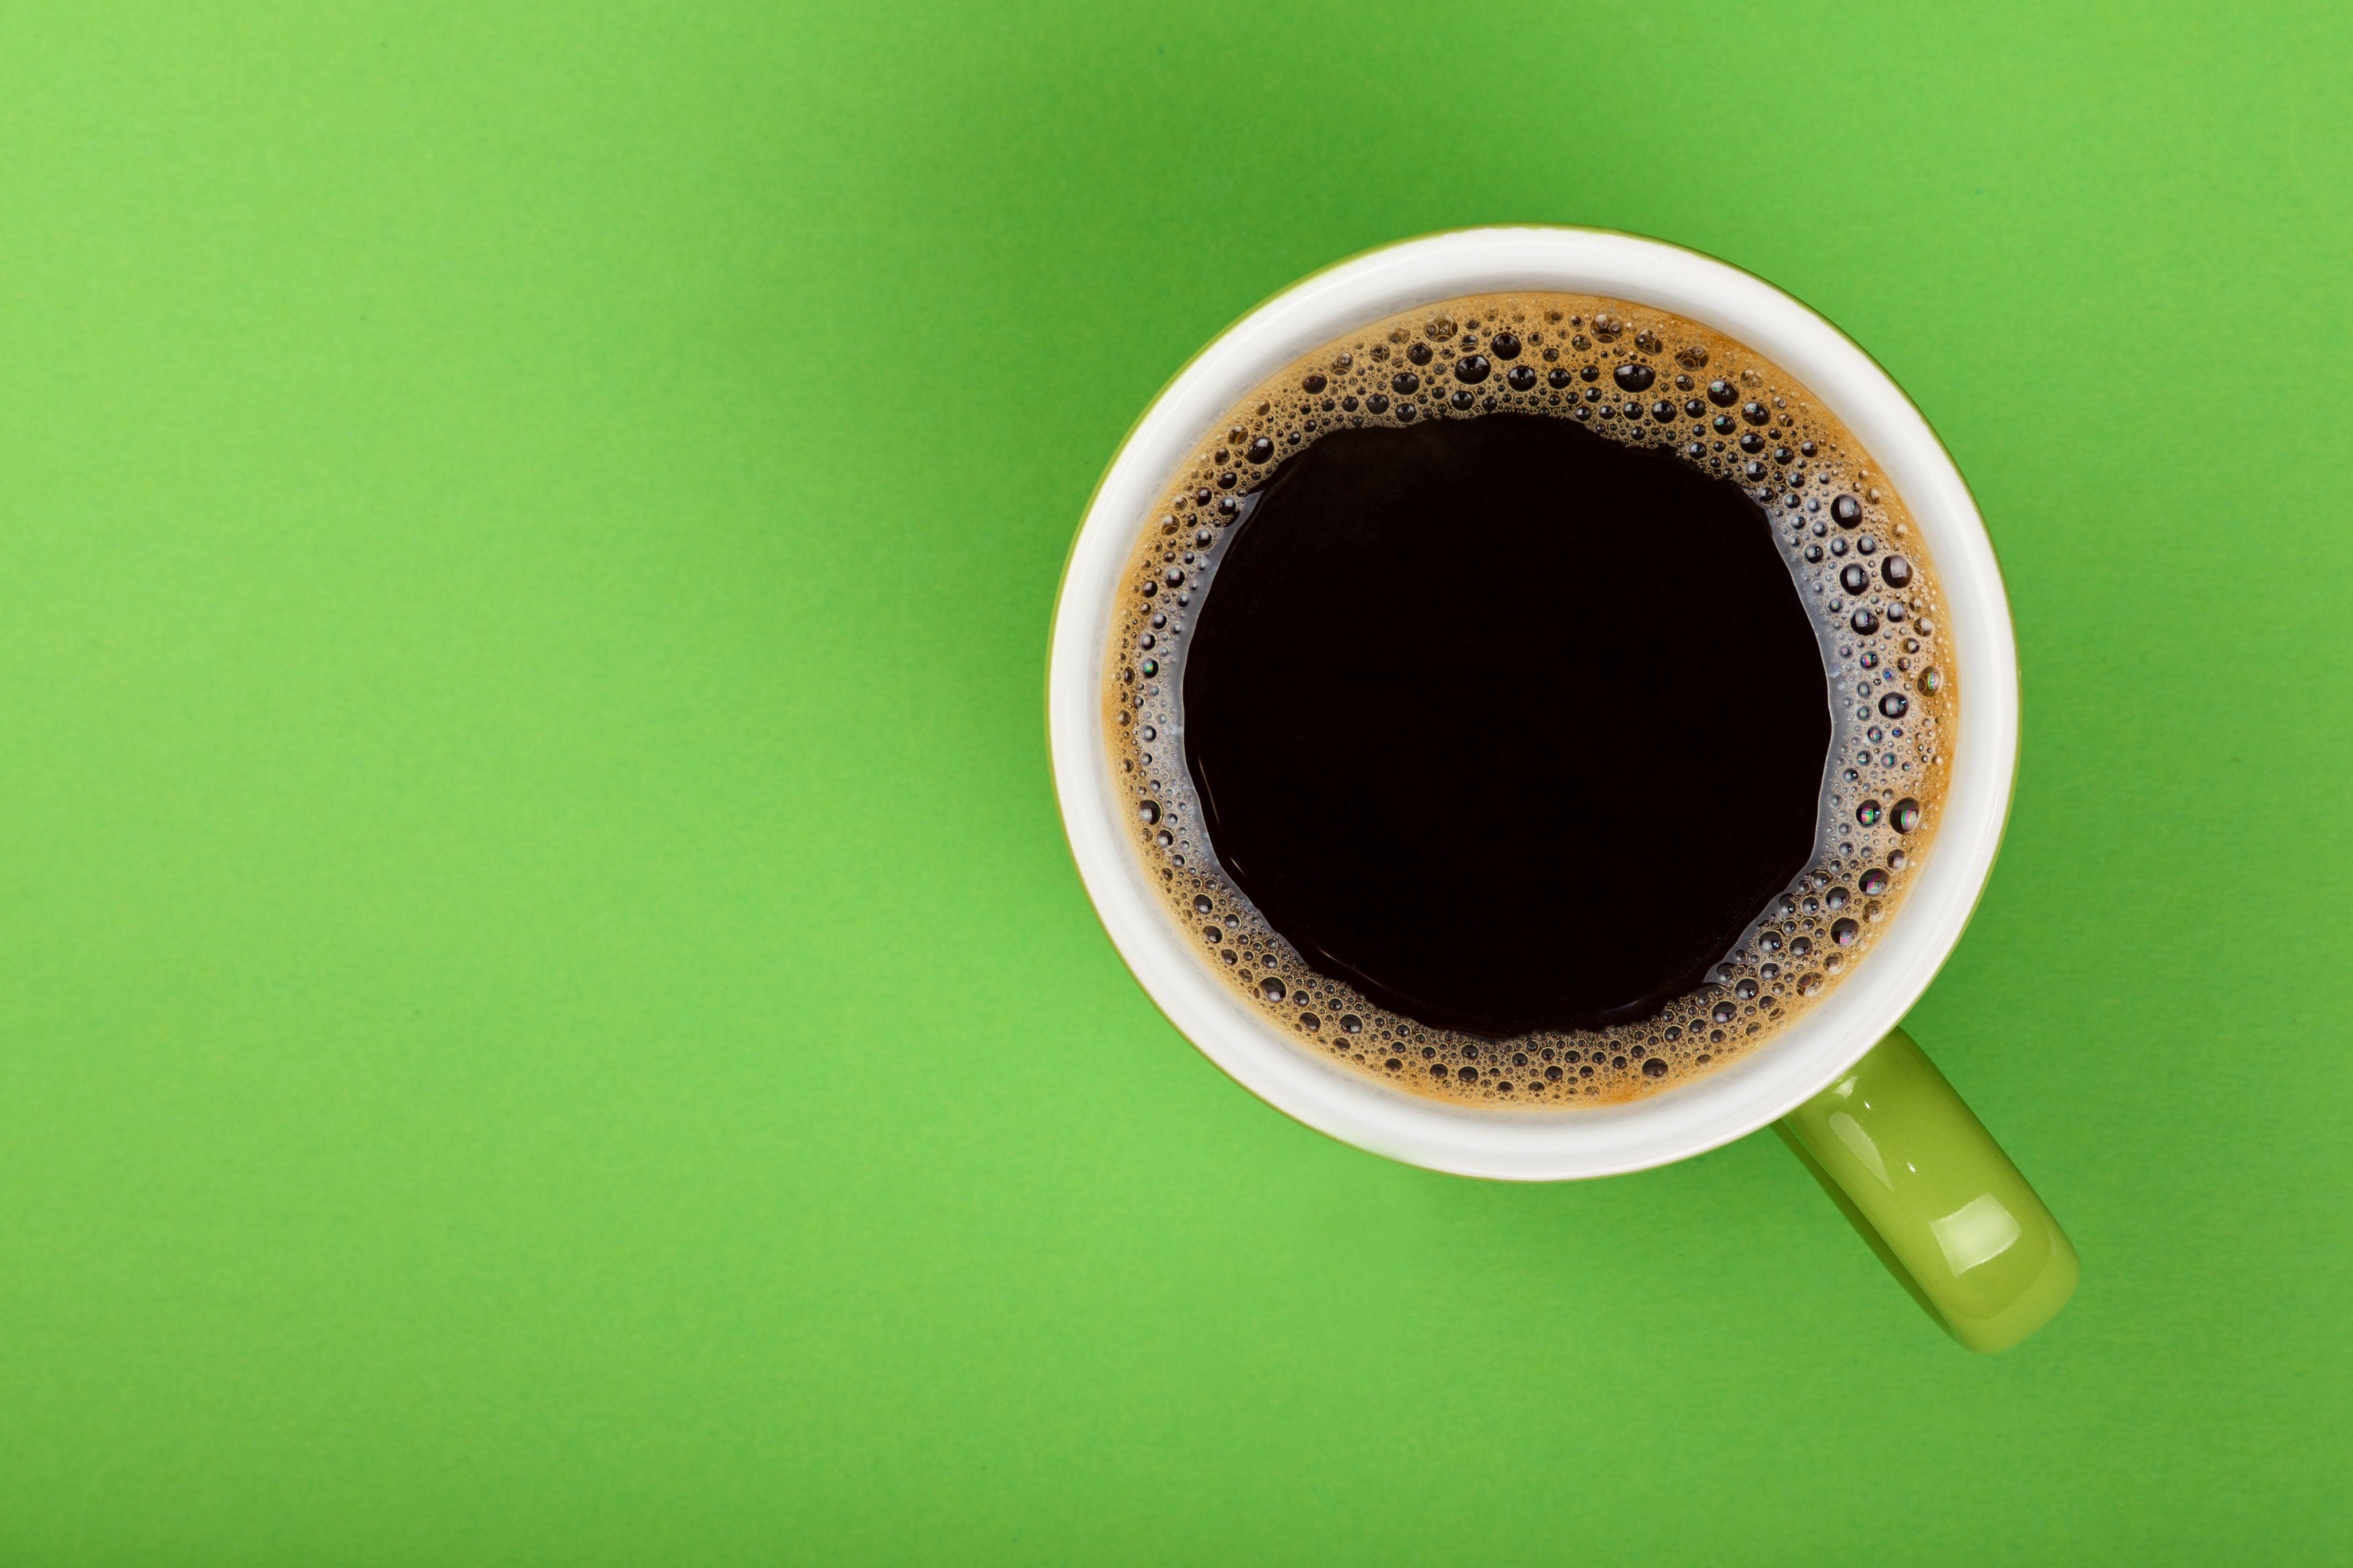 12 Healthy Starbucks Drinks Nutritionists Swear By